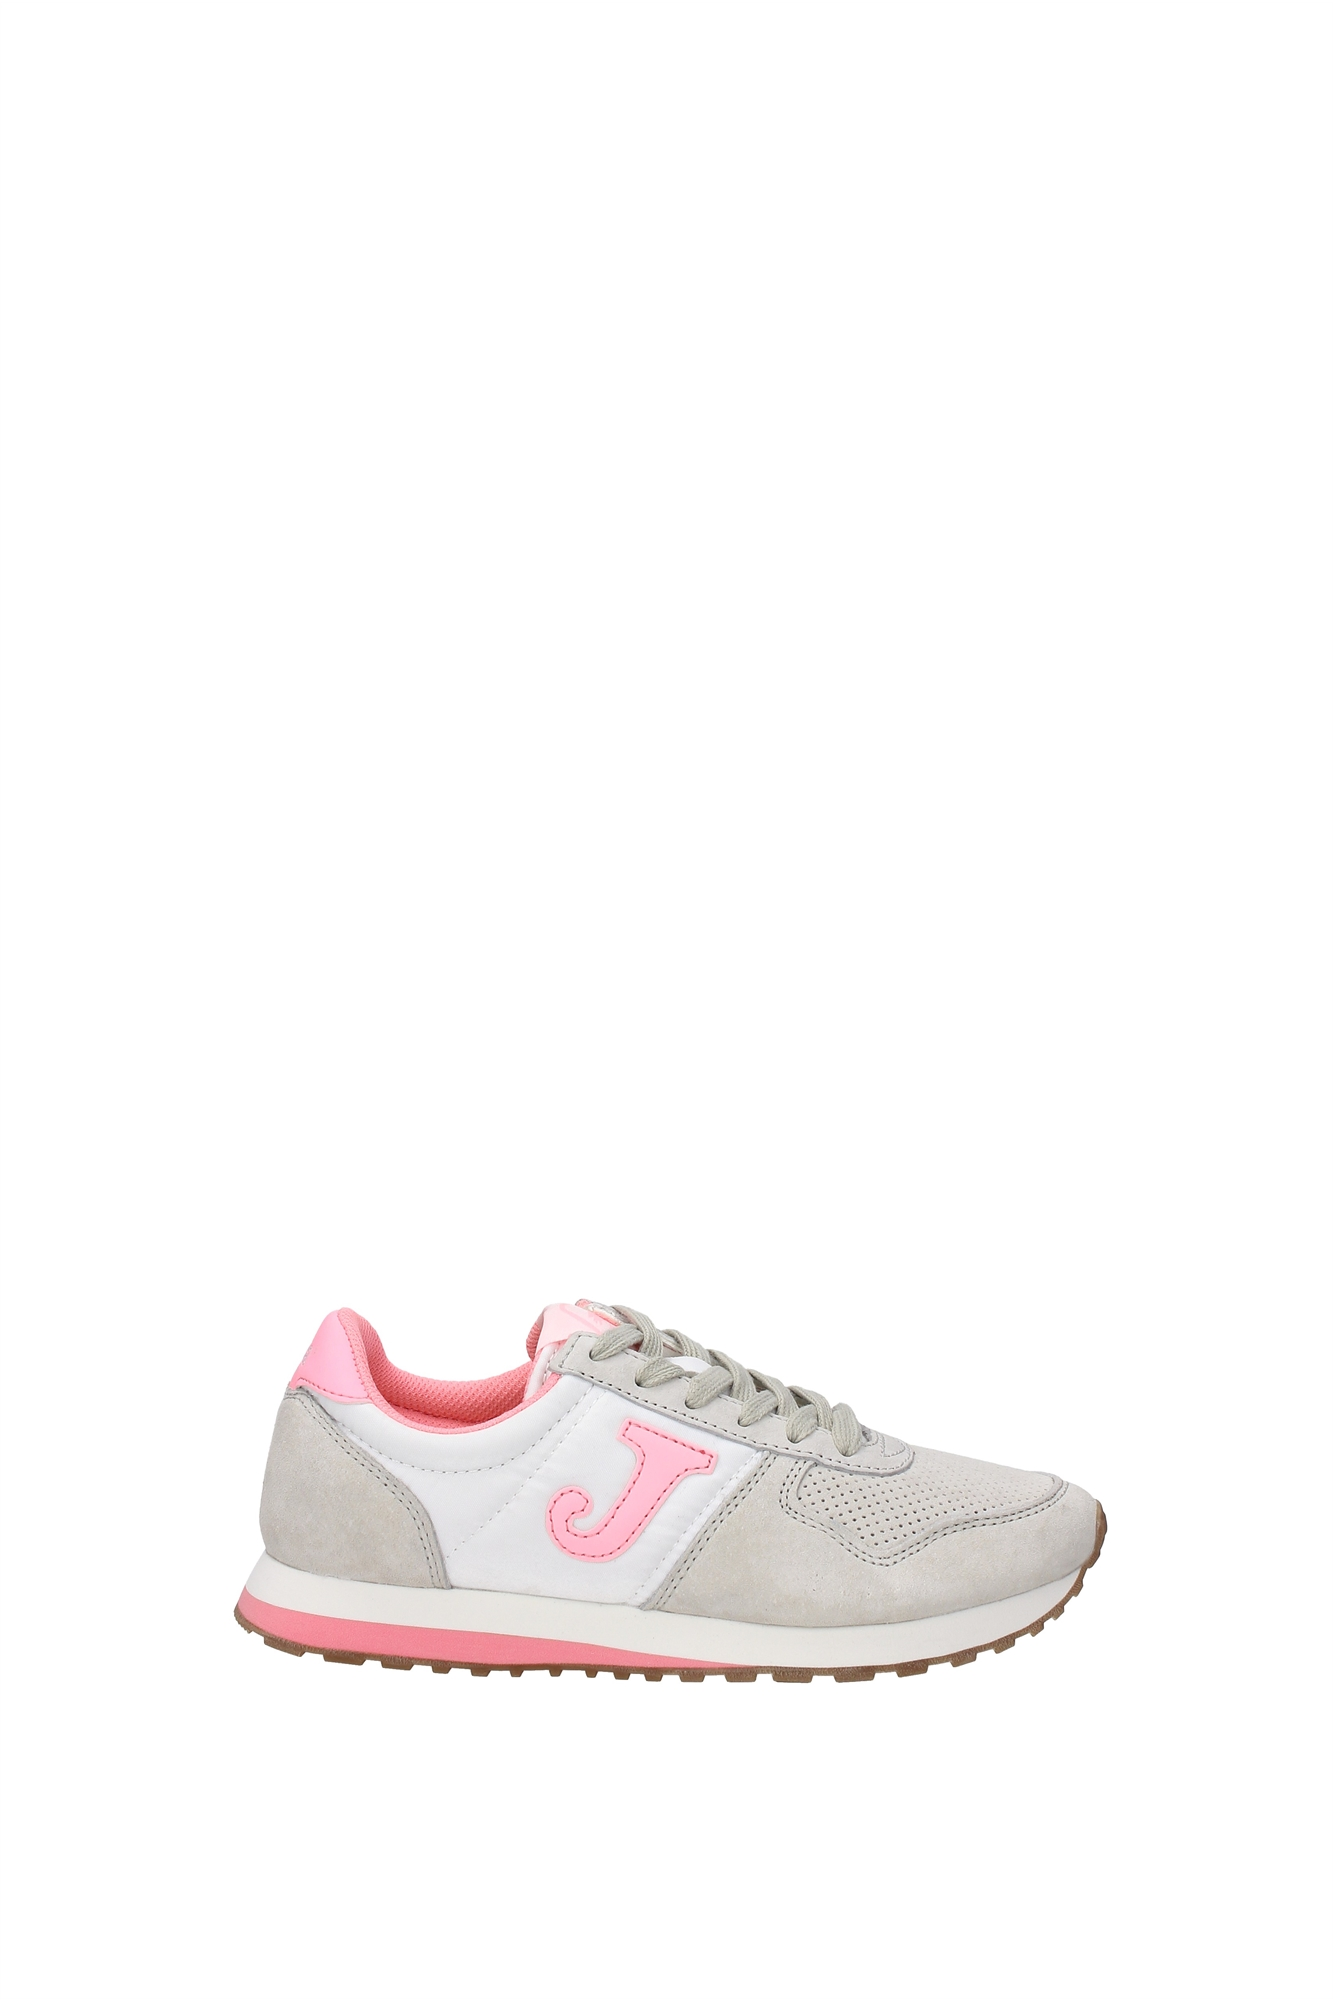 Sneakers Joma - Damenschuhe - Joma Tessuto (C200LW602) 7be743